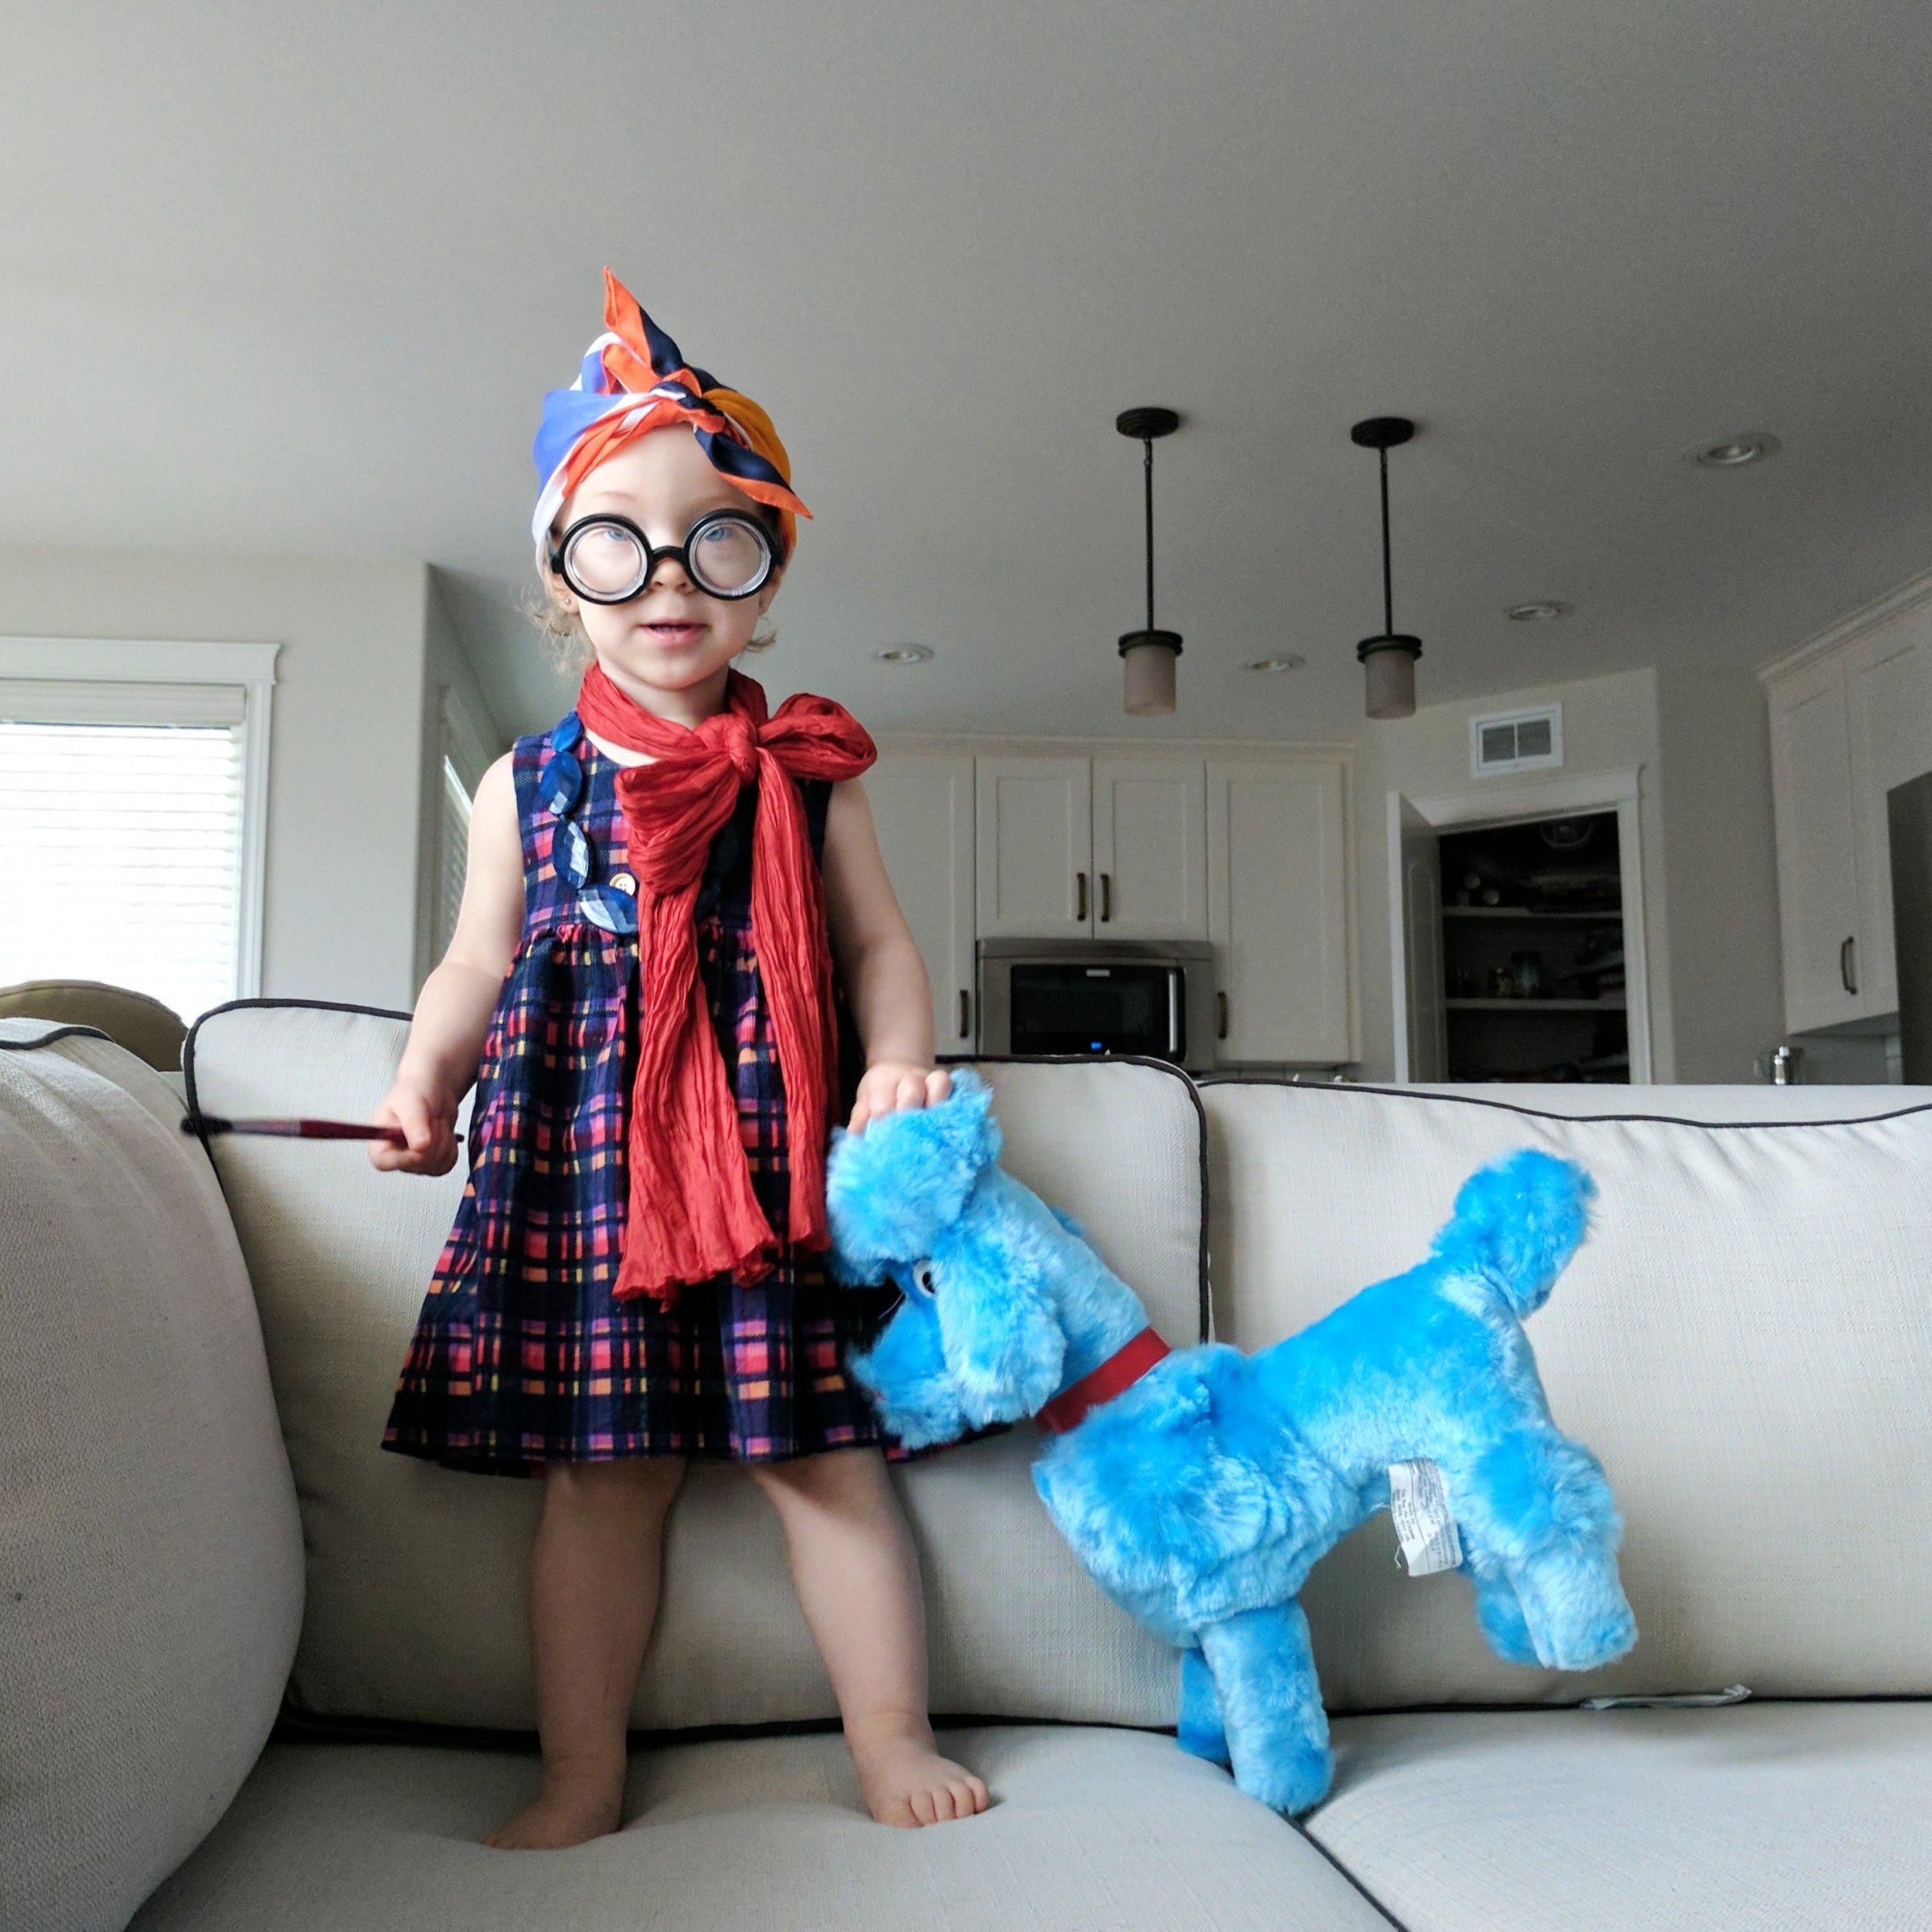 iris apfel halloween costume idea.jpg